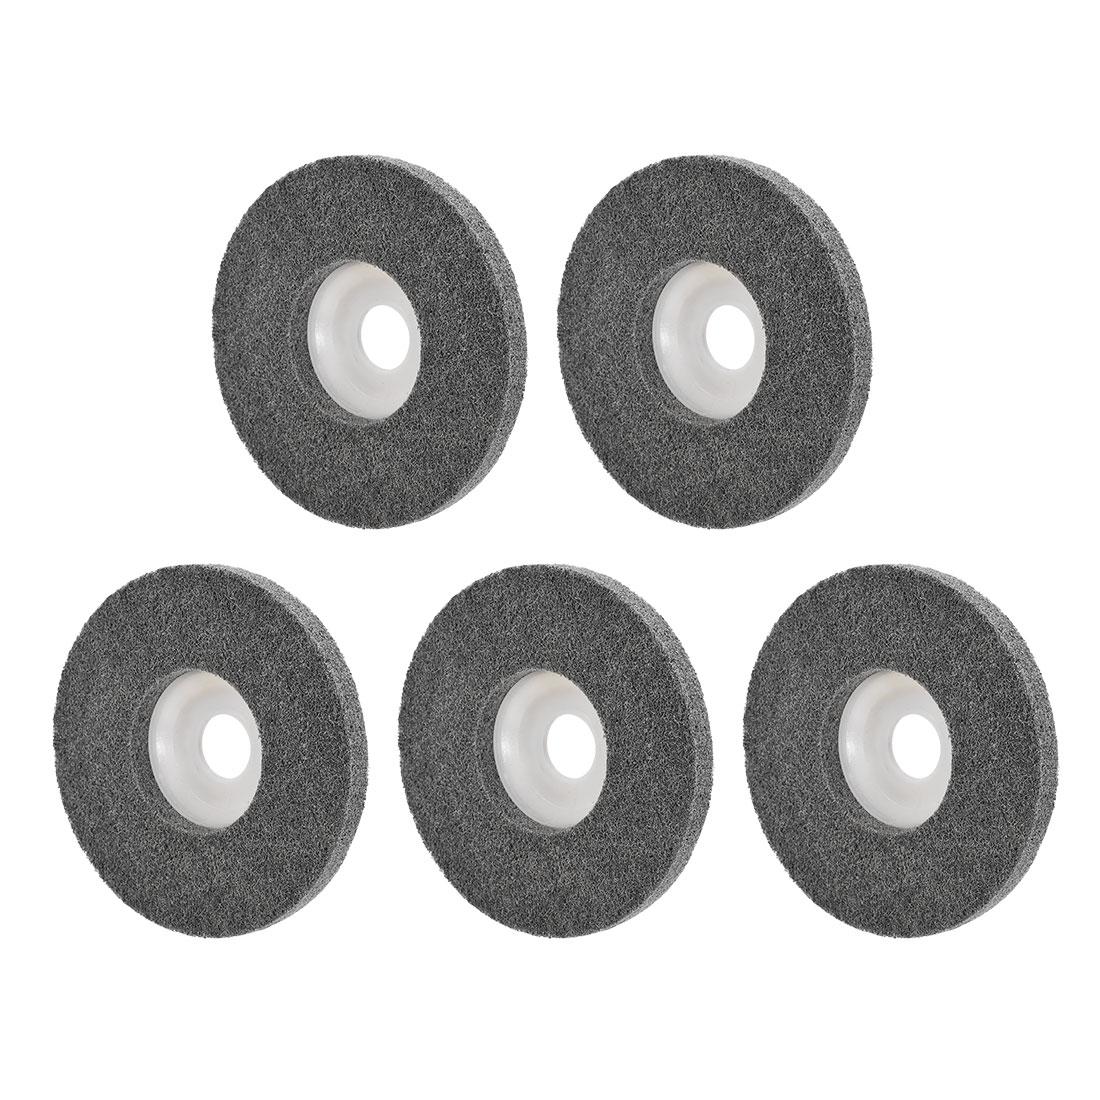 5 Inch Polishing Wheel Buffing Pad Felt Disc for 100 Angle Grinders White 5pcs